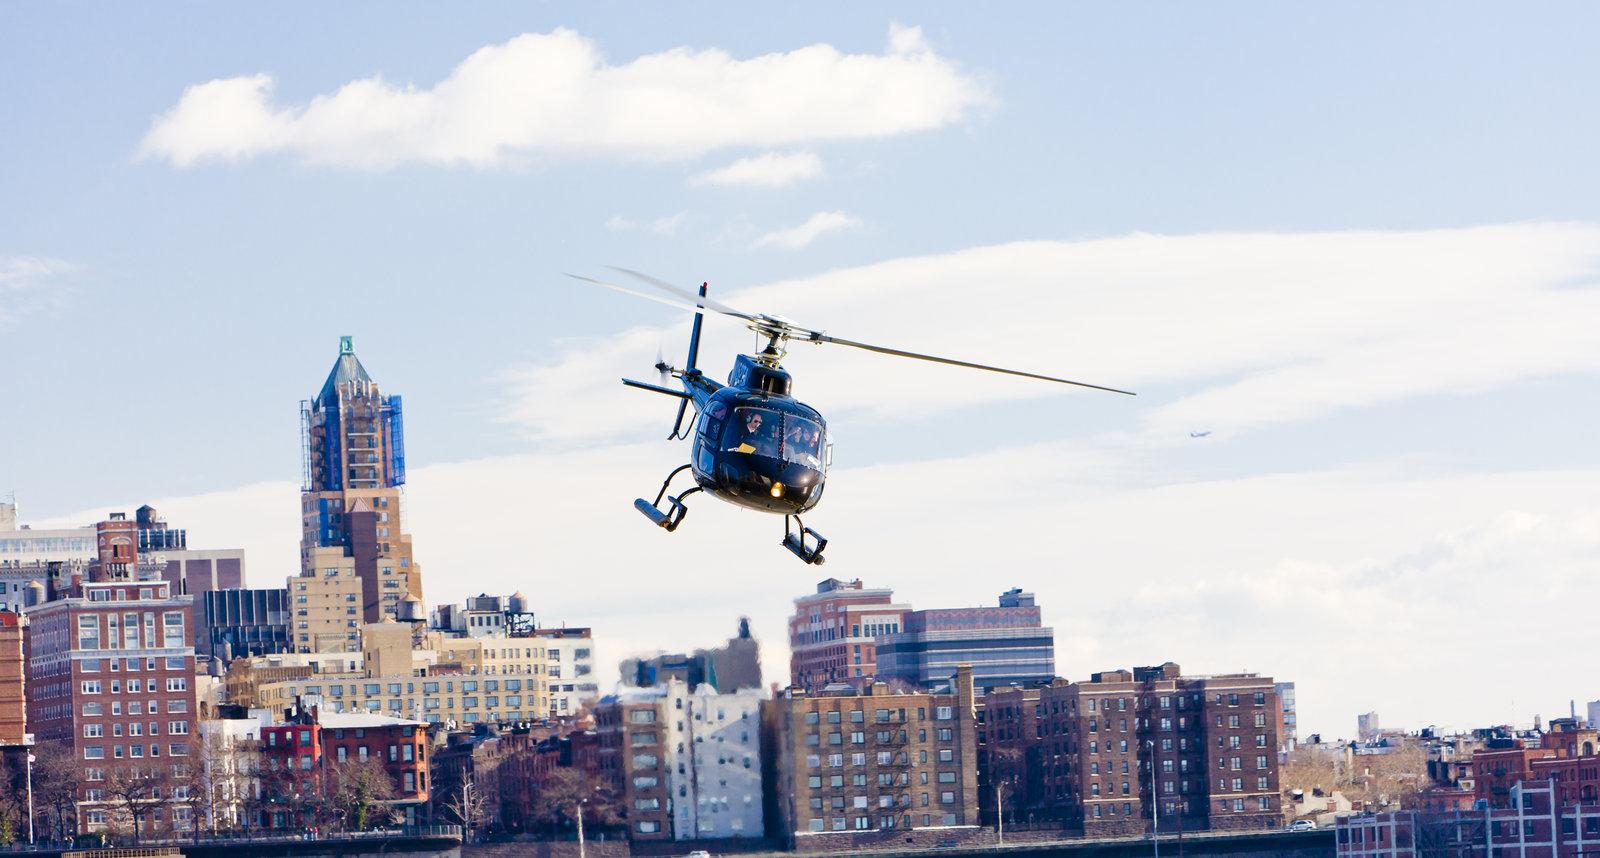 Bedford-Stuyvesant Brooklyn, NY Private Investigator